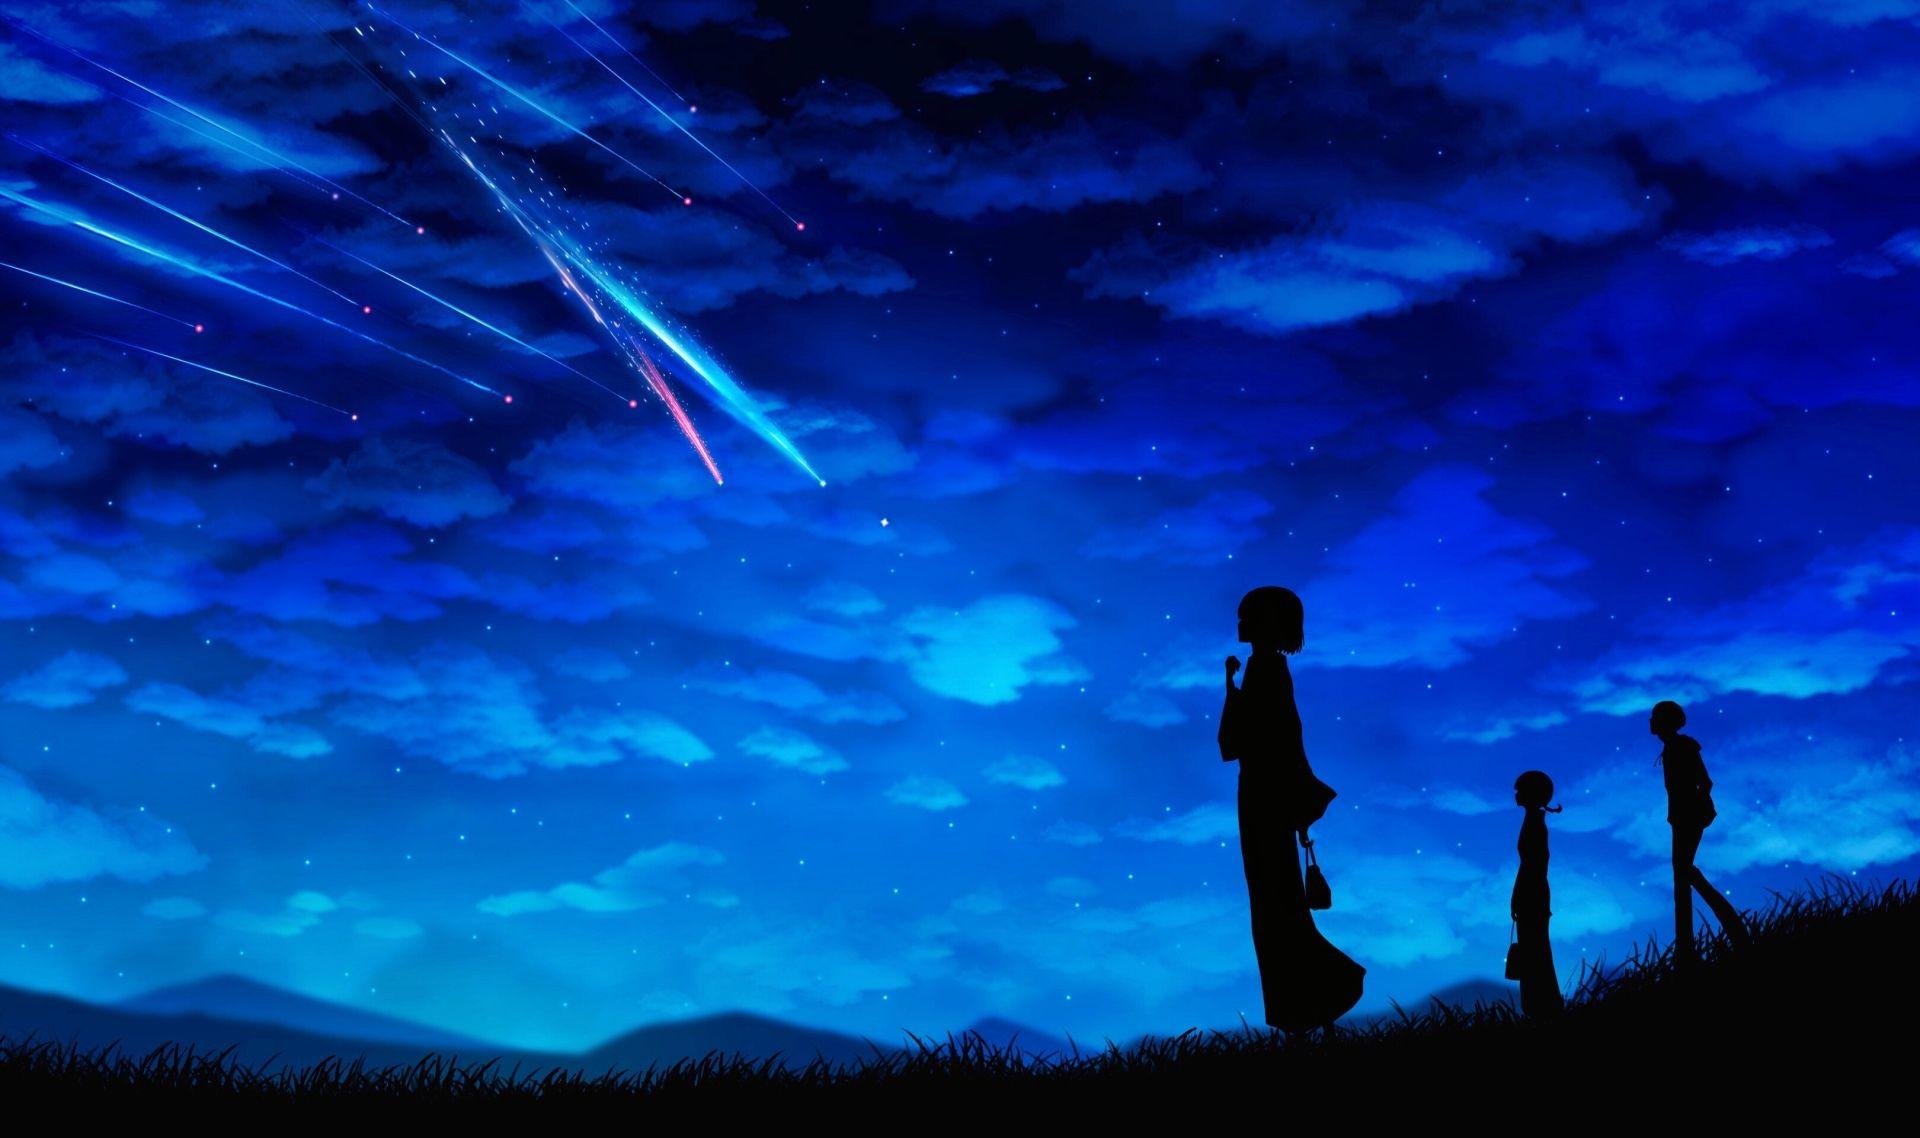 Anime Your Name Kimi No Na Wa Wallpaper Kimi No Na Wa Your Name Anime Kimi No Na Wa Wallpaper